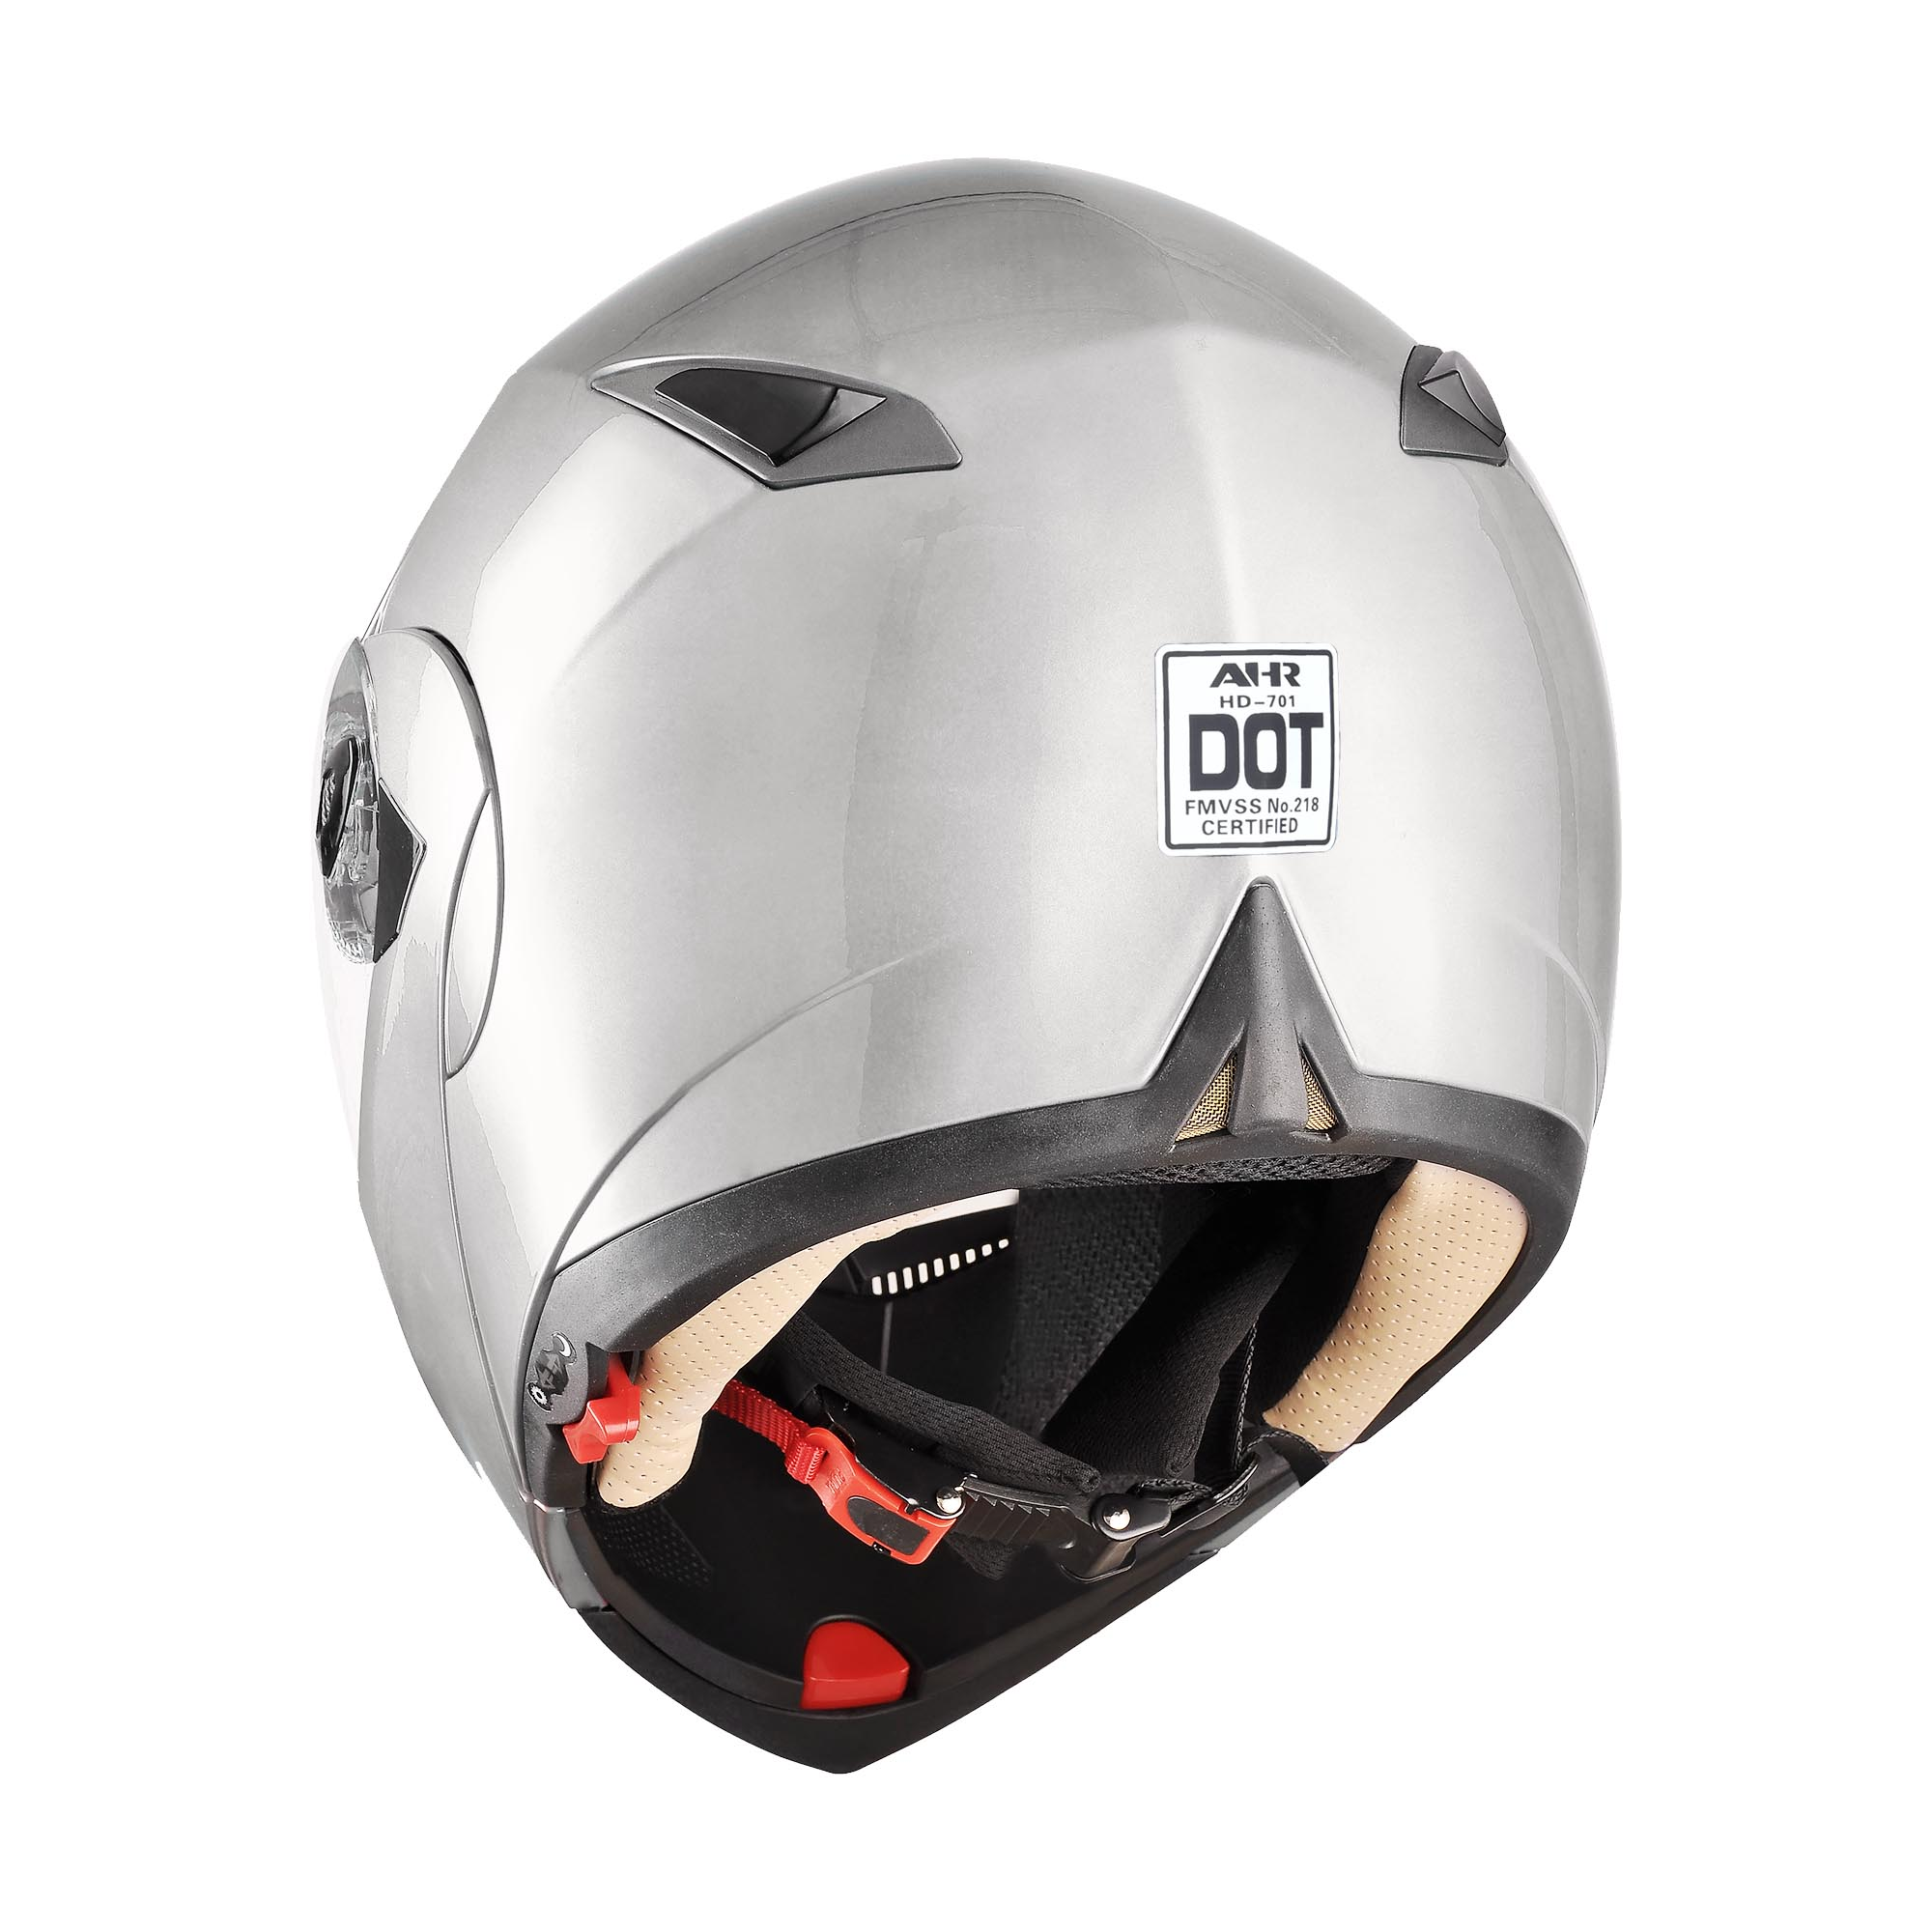 miniature 178 - DOT Flip up Modular Full Face Motorcycle Helmet Dual Visor Motocross Size Opt